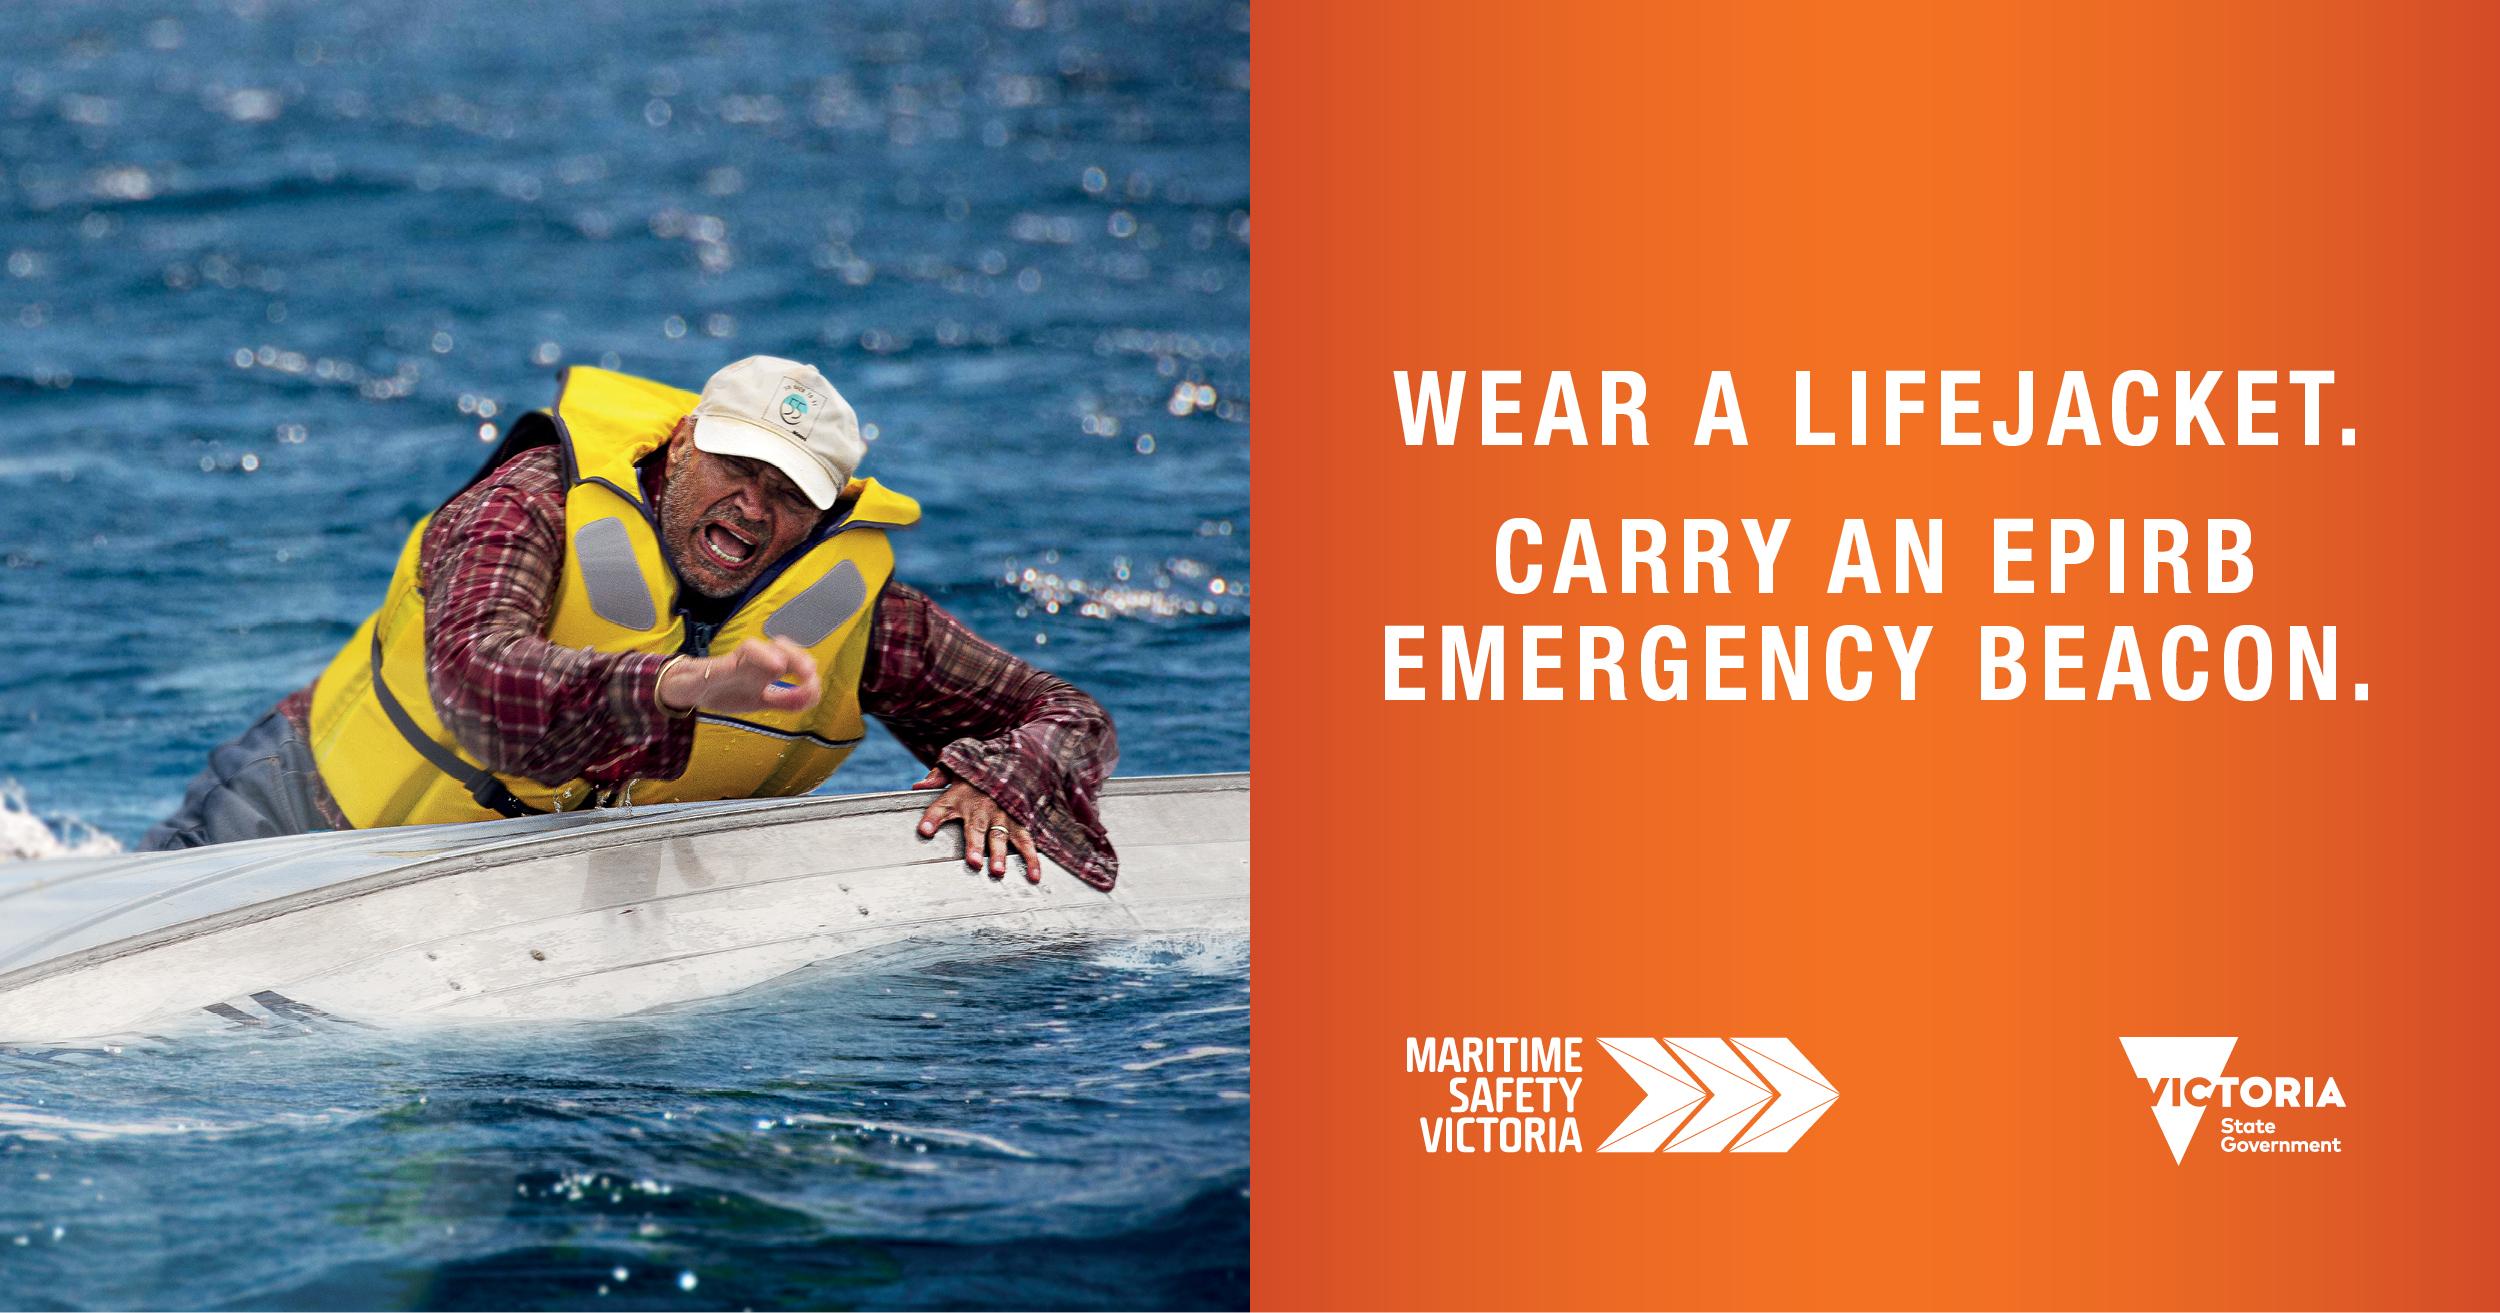 Wear a lifejacket - carry an emergency beacon